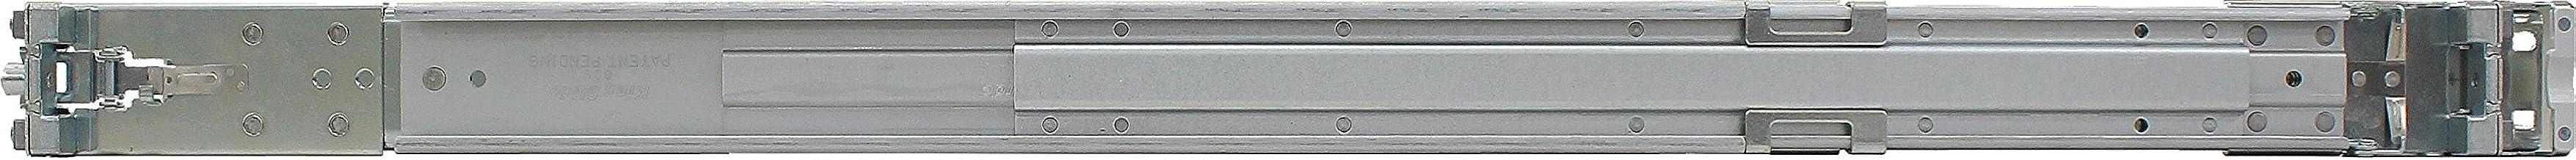 Synology Sliding Rail For 1U/2U/3U Models (RKS1317)